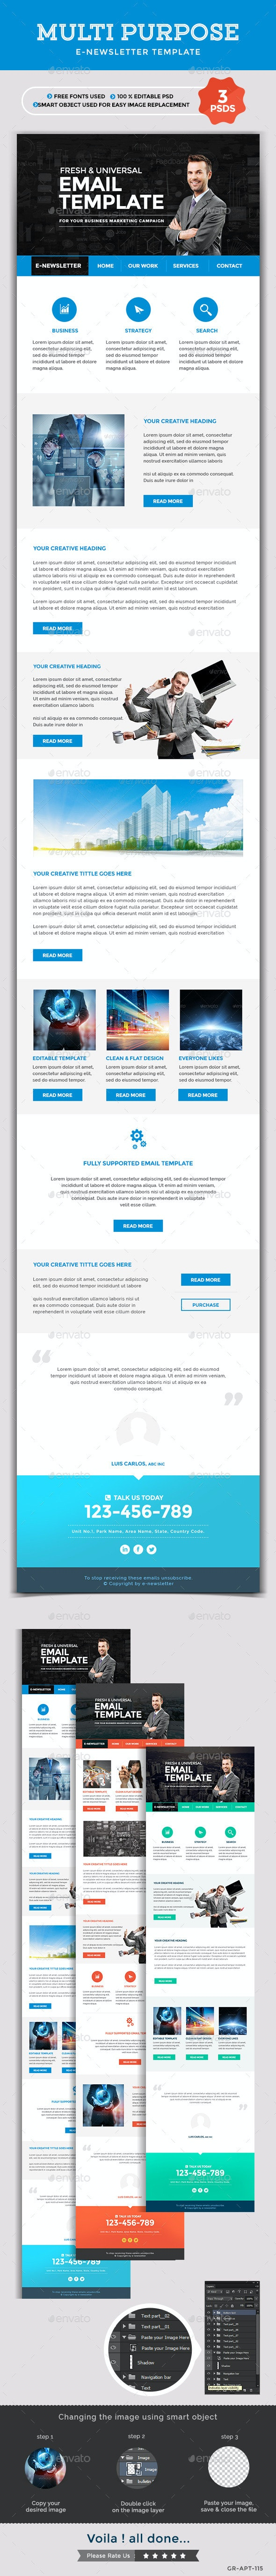 Multi Purpose Newsletter Template - 3 designs - E-newsletters Web Elements